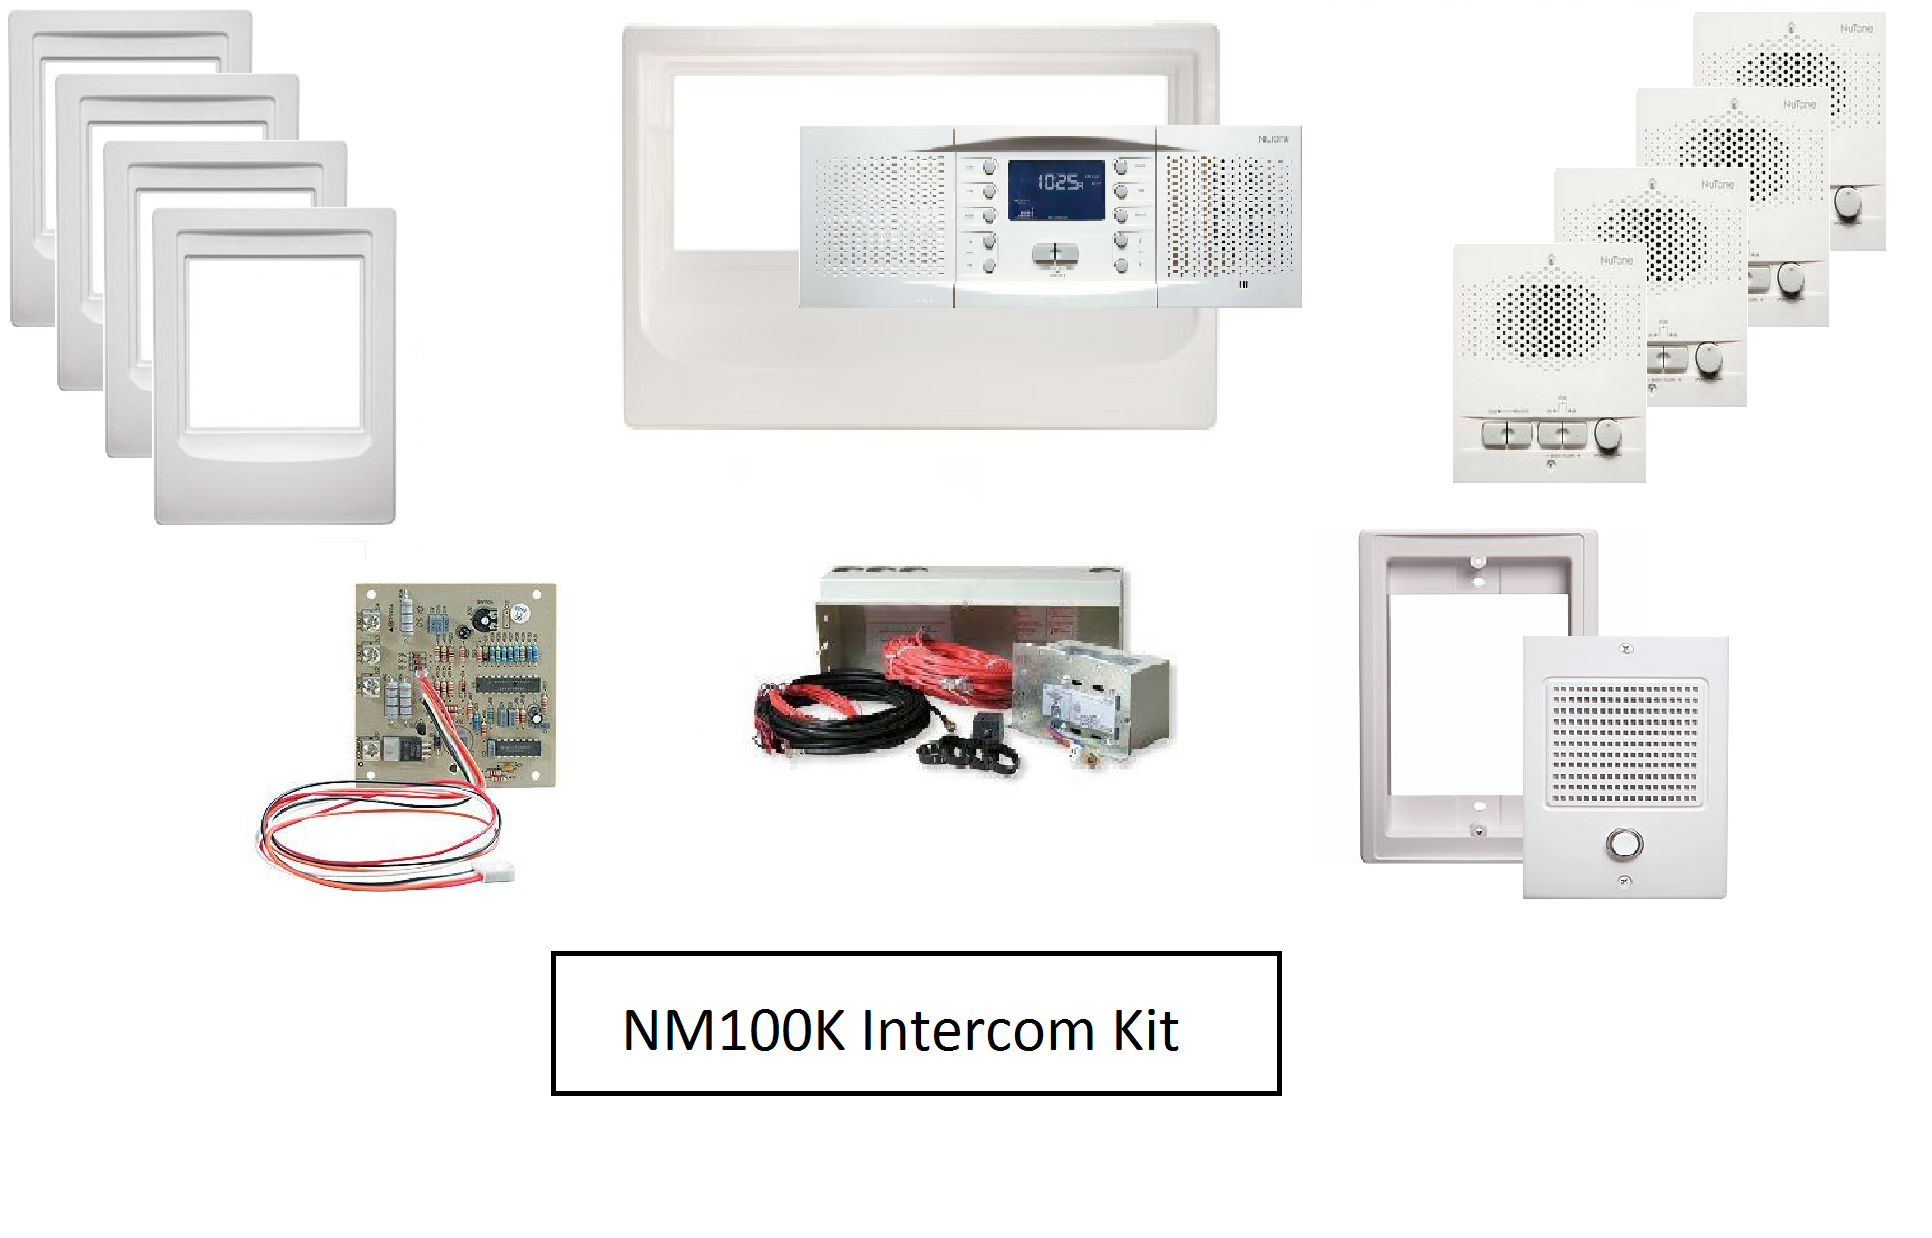 Manualguide Home Intercom Systems Wiring Drawings Nutone Diagram Nm100 Schematics Rh Leonardofaccoeditore Com